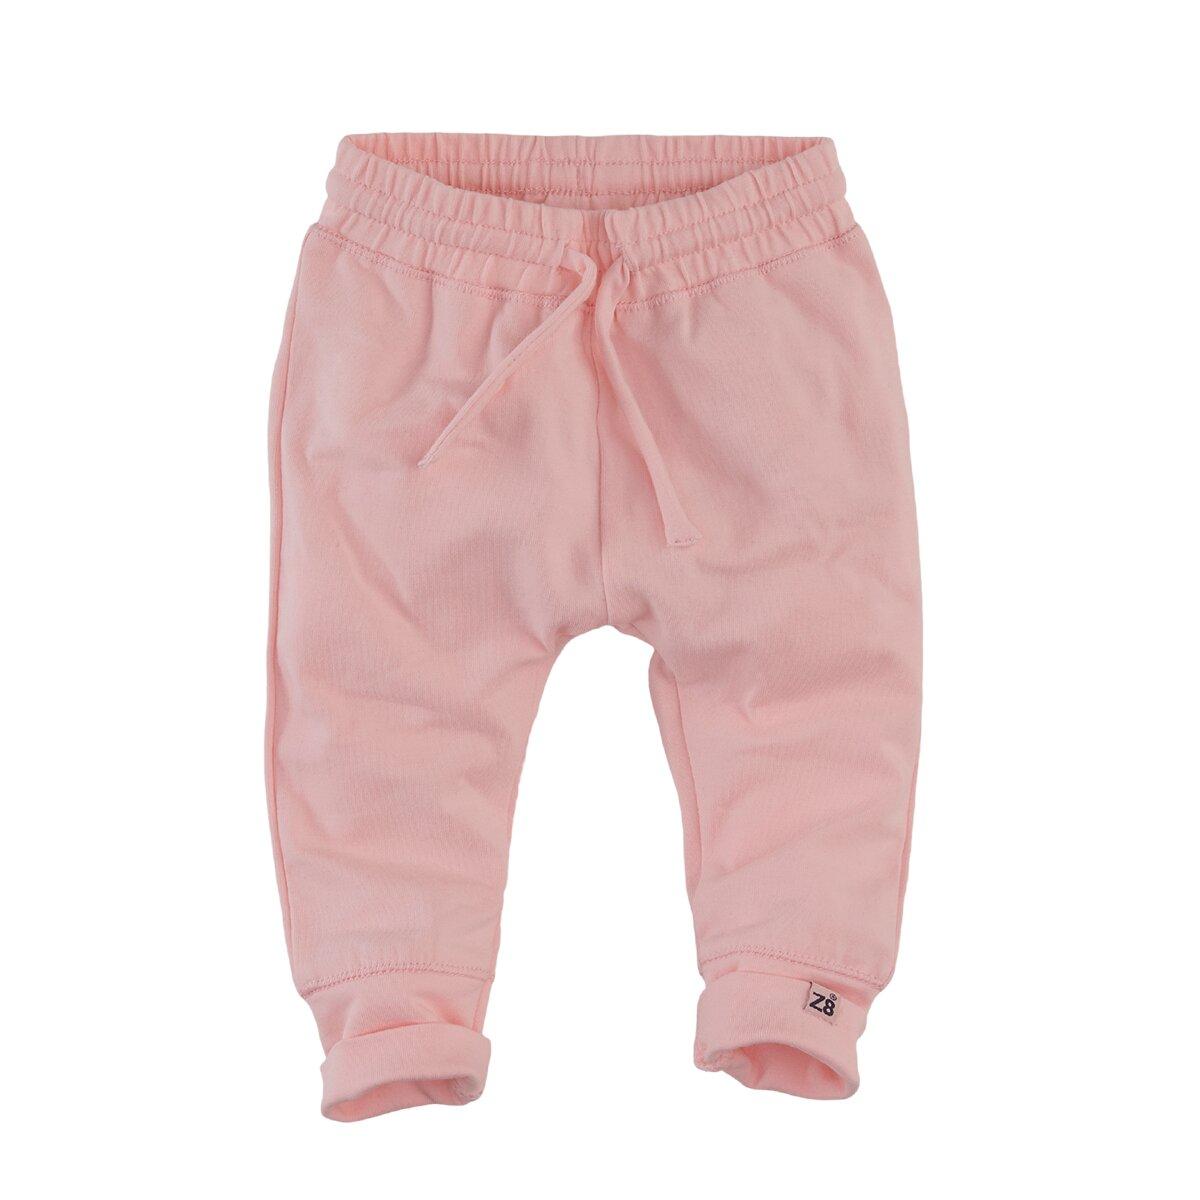 z8-newborn-noos190026dodo-soft-pink